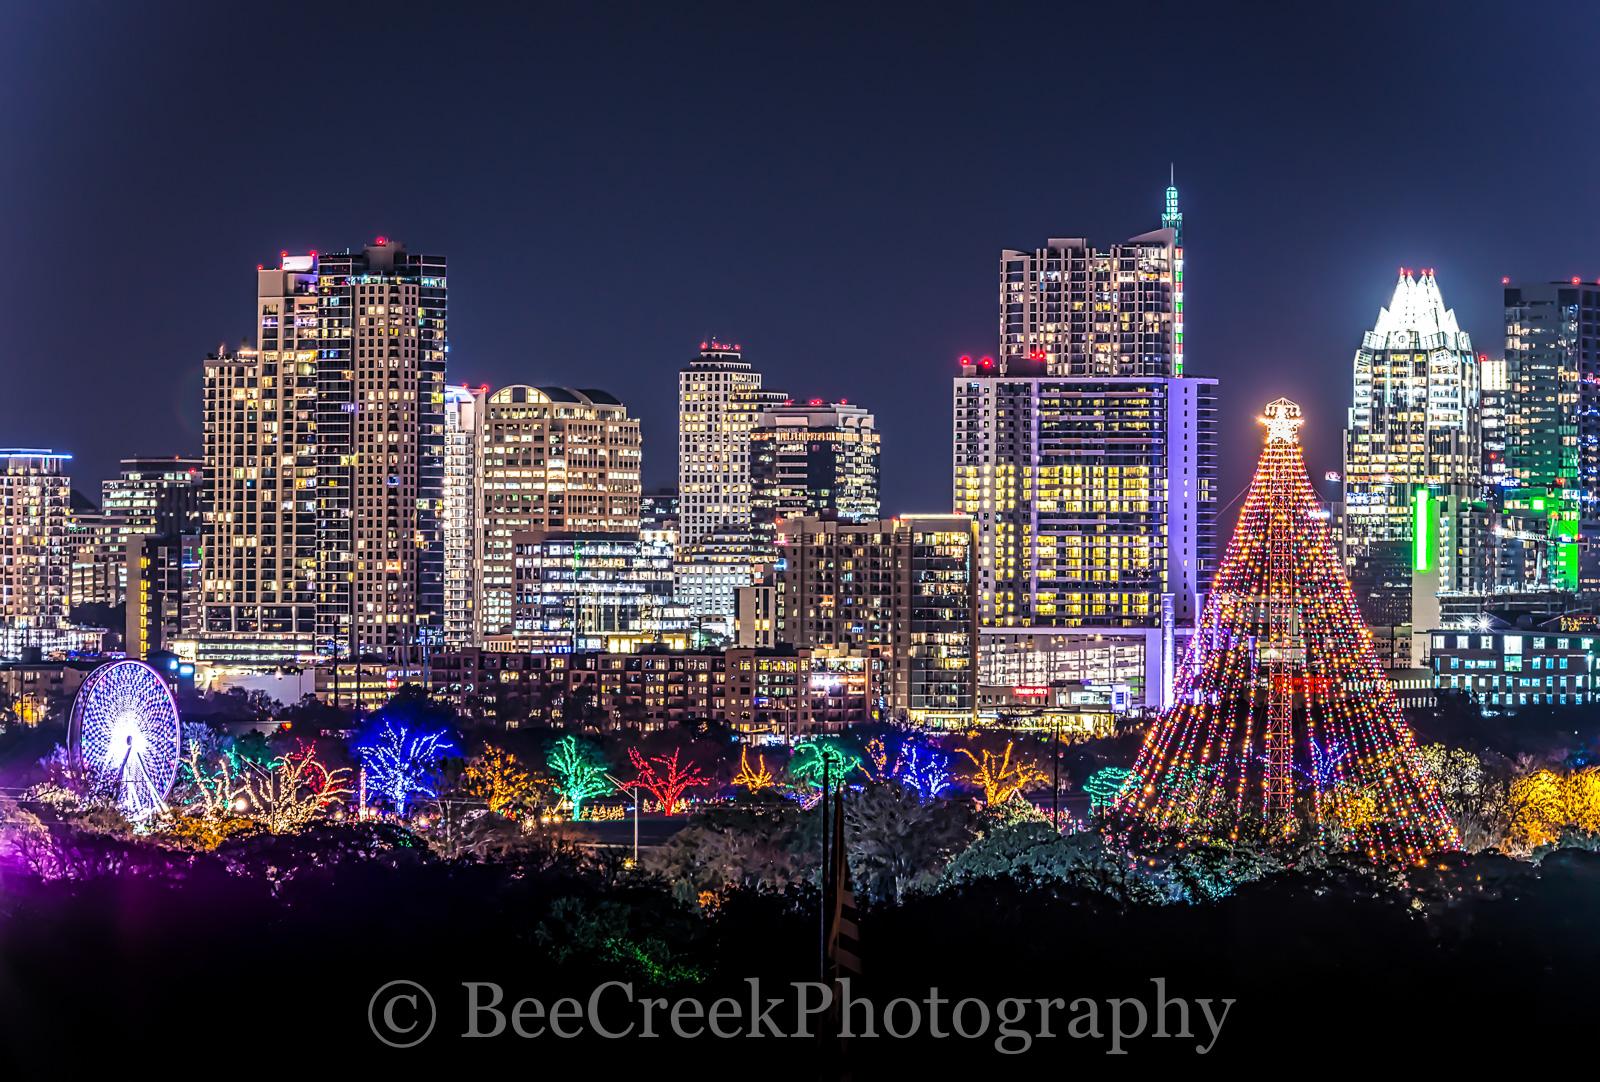 Austin, Austin 360 Condos, Christmas Tree, Ferris wheel, Frost, Zilker Christmas tree, cityscape, cityscapes, high rises, holiday, holidays, skyline, skylines, trail of lights, austin skylines, austin, photo